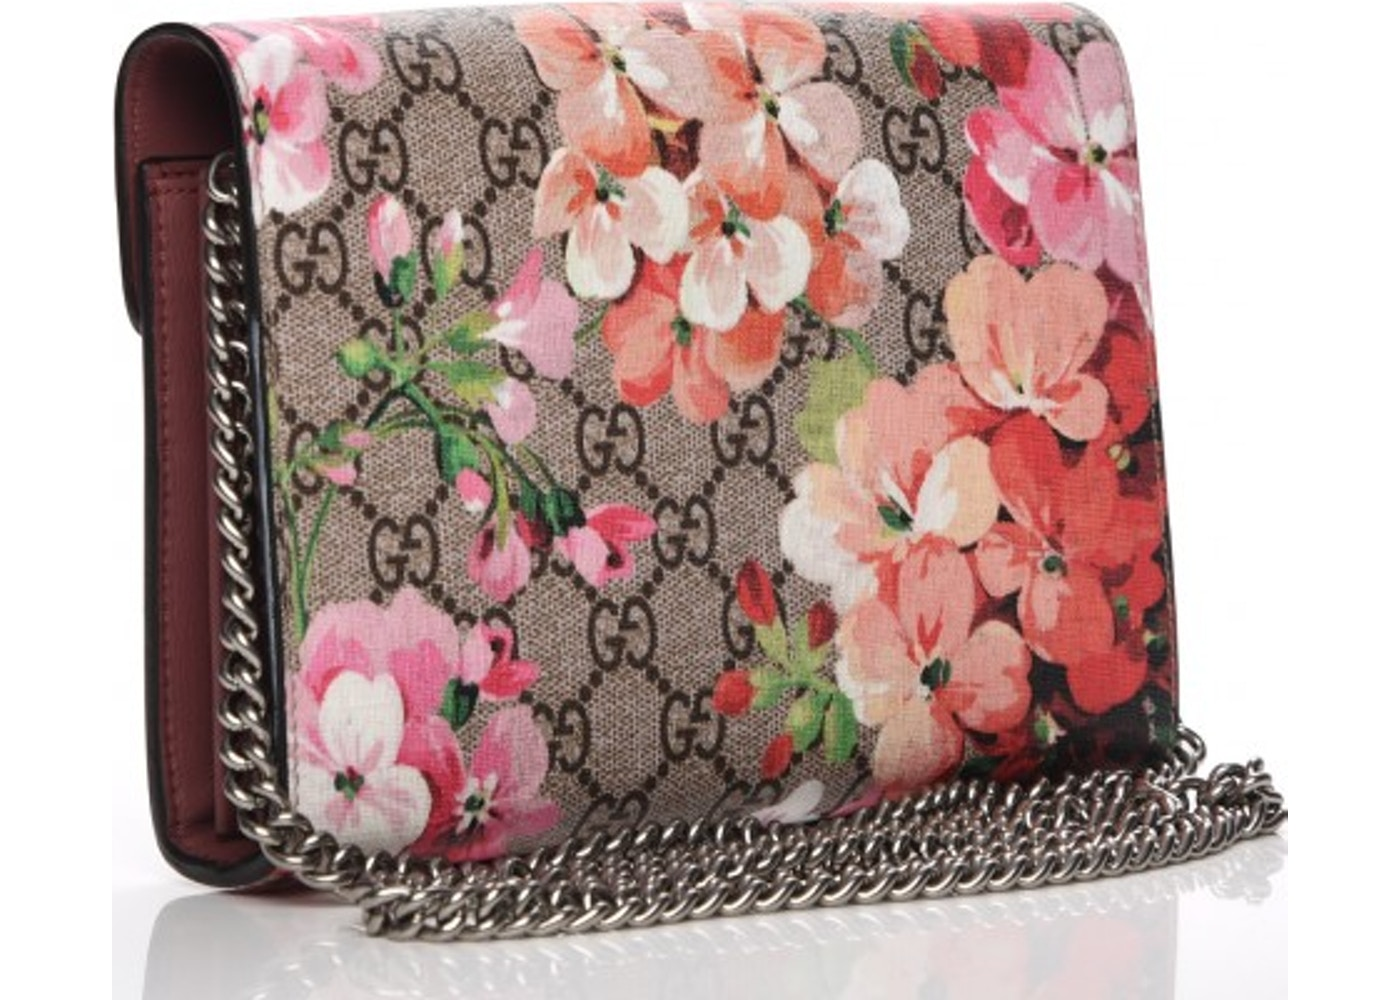 c73c60476fbd Gucci Dionysus Chain Wallet GG Supreme Blooms Mini Antique Rose